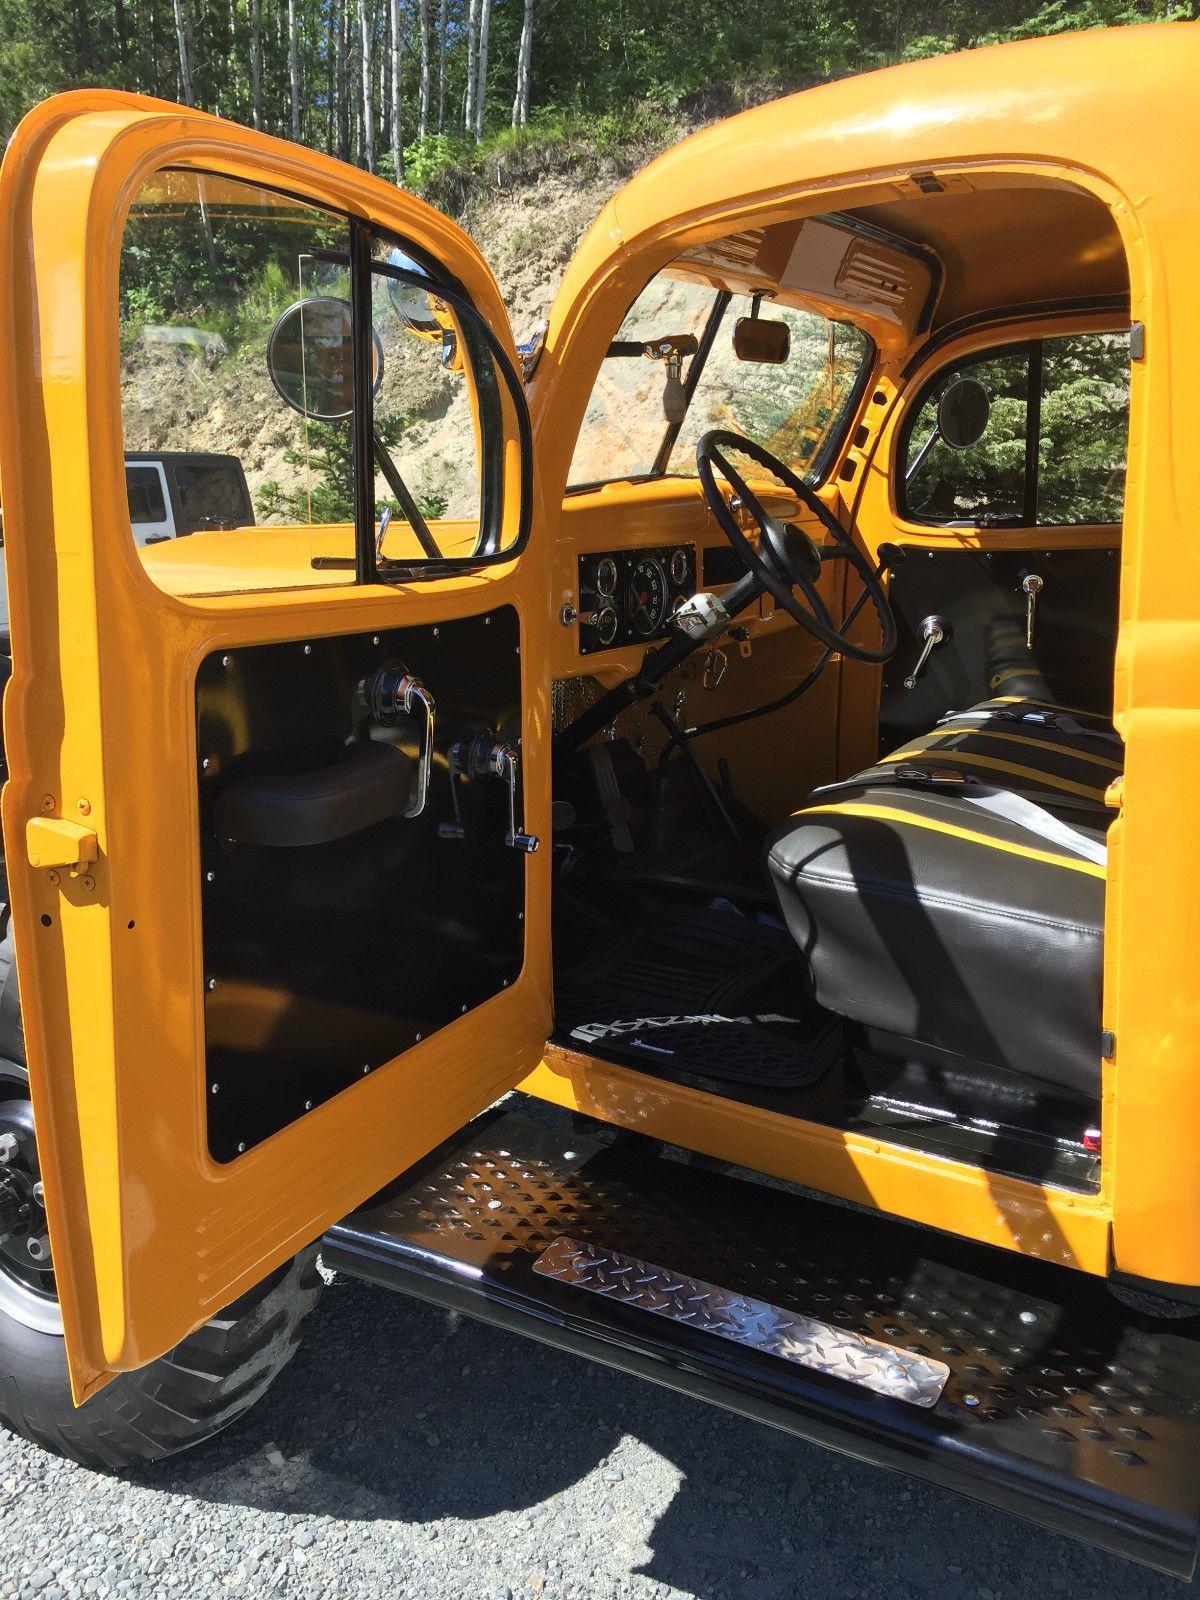 Us 30 000 00 Used In Ebay Motors Cars Trucks Dodge Dodge Power Wagon Power Wagon Dodge